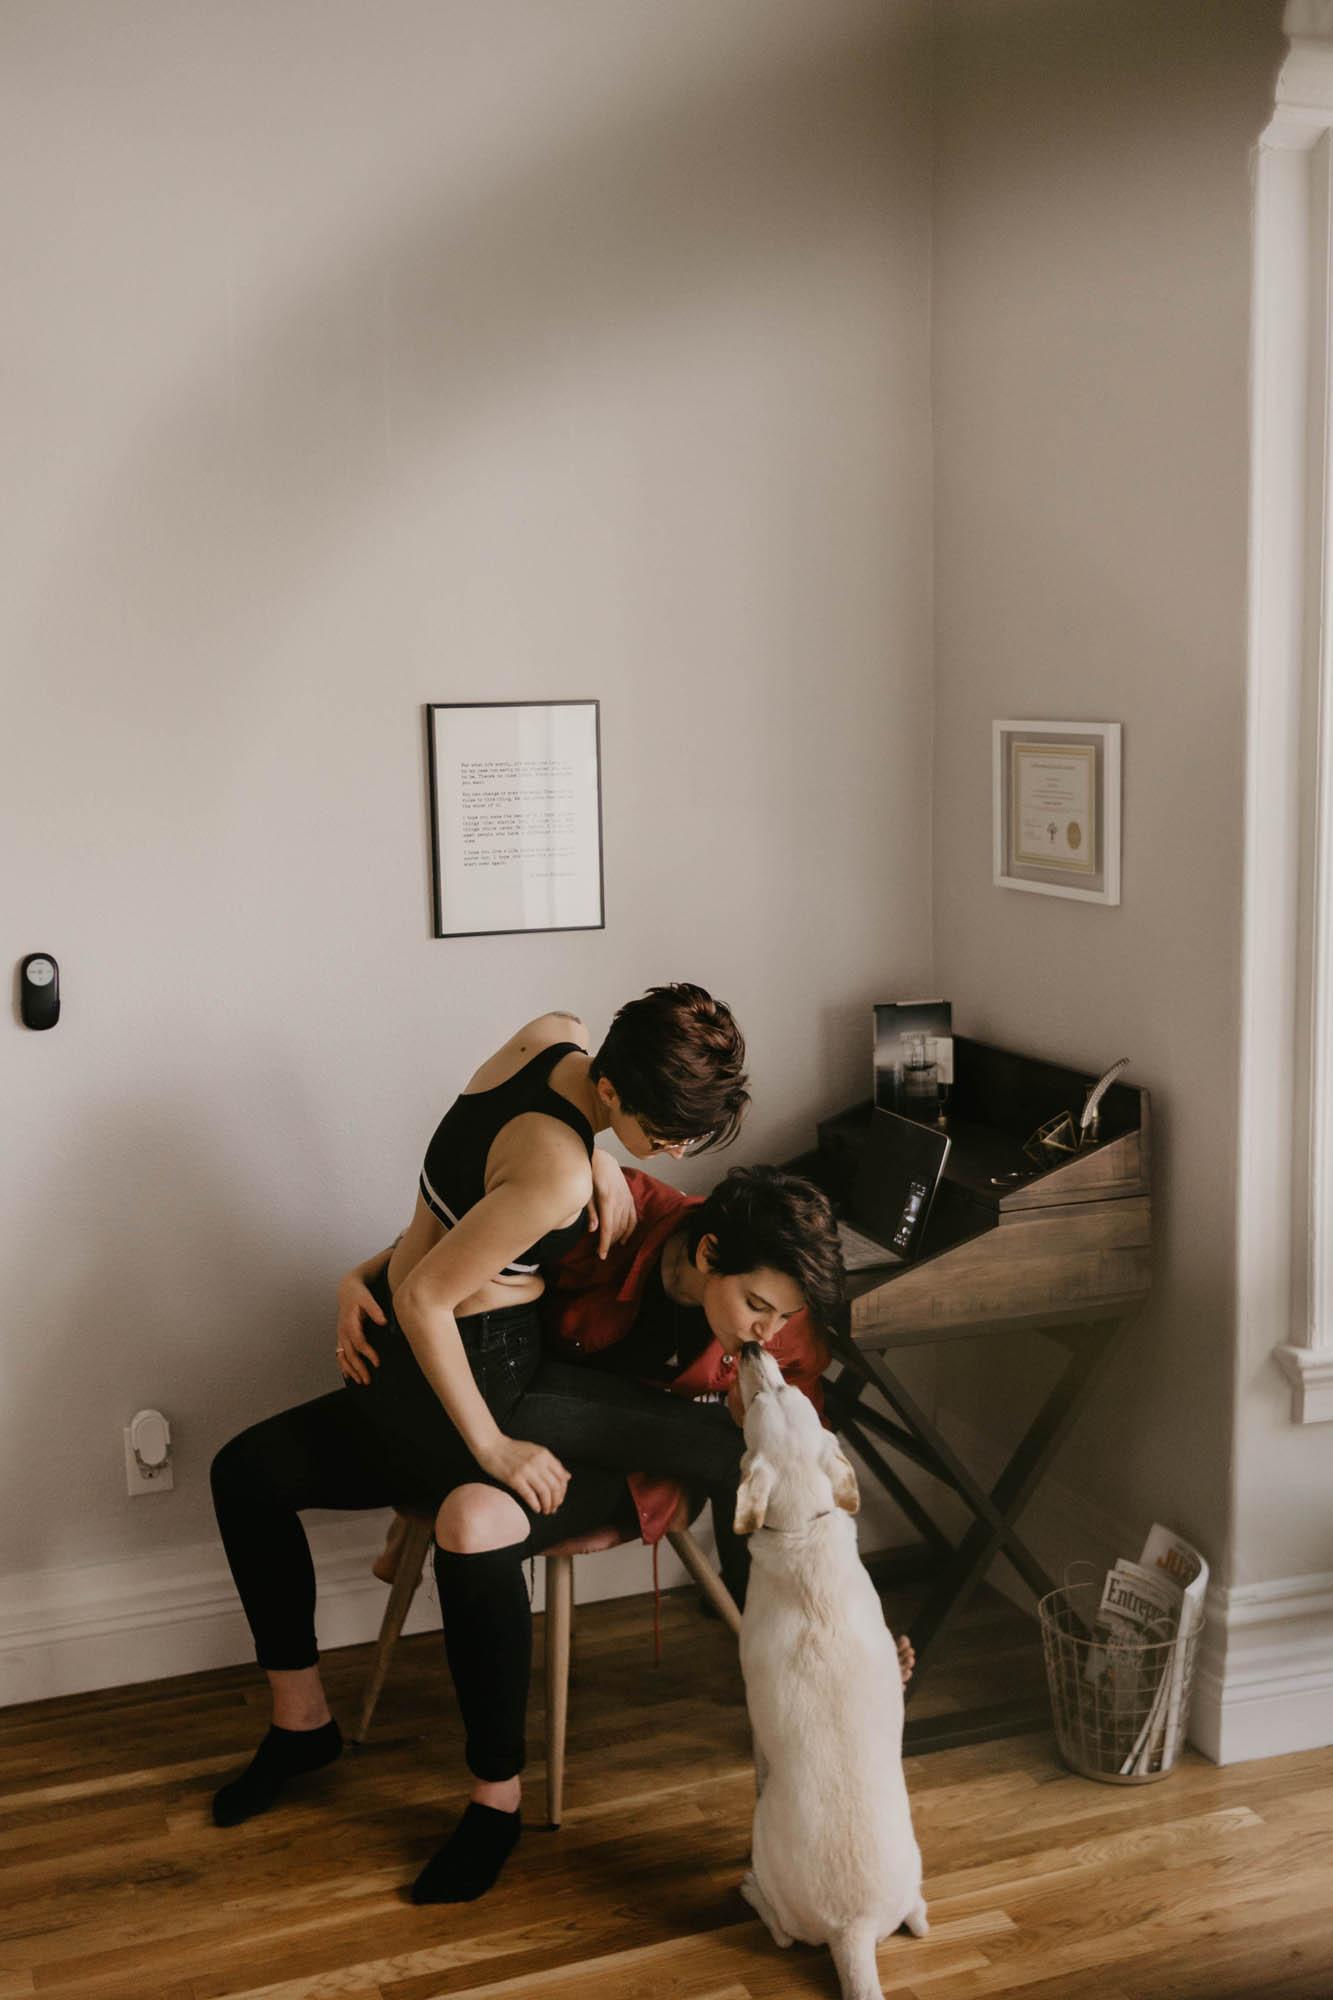 Isolation Photoshoot - Liv Shultheis Photography - San Franscico California Photography